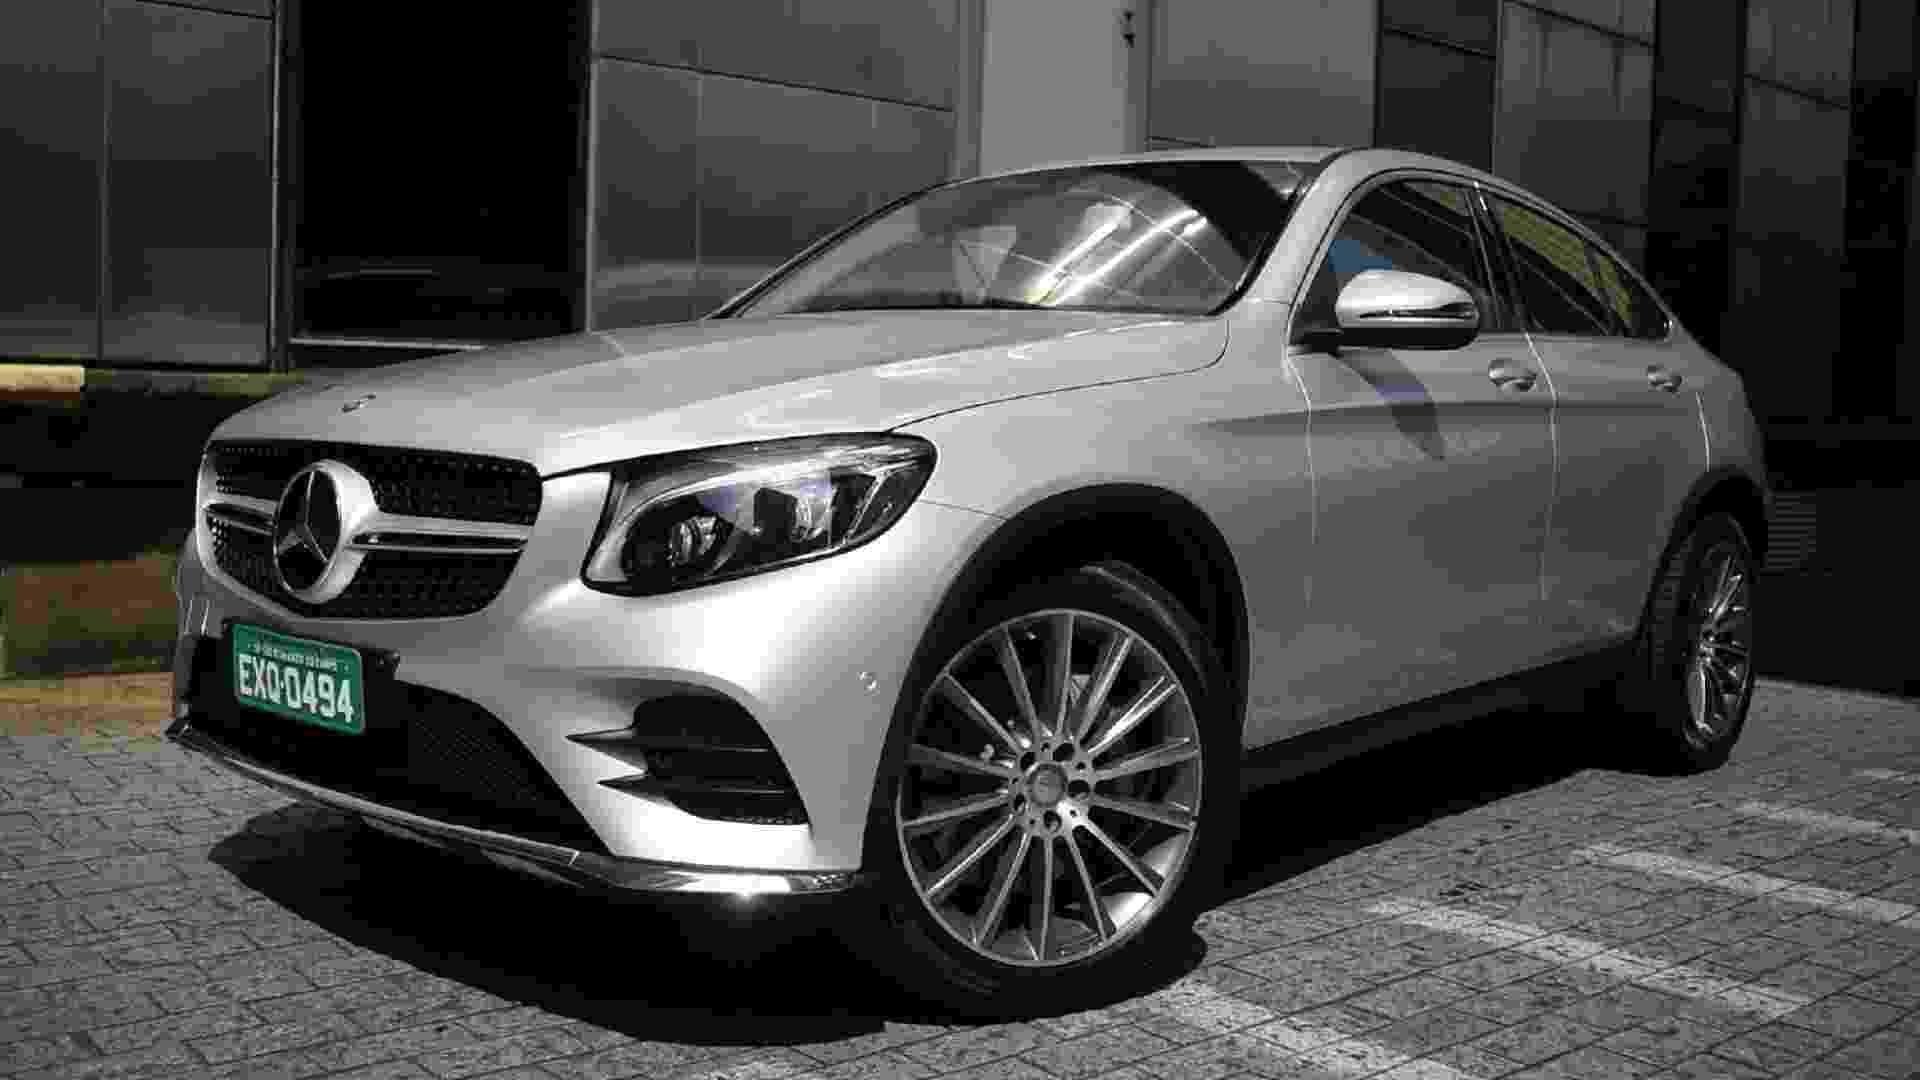 Mercedes-Benz GLC Coupé - Murilo Góes/UOL